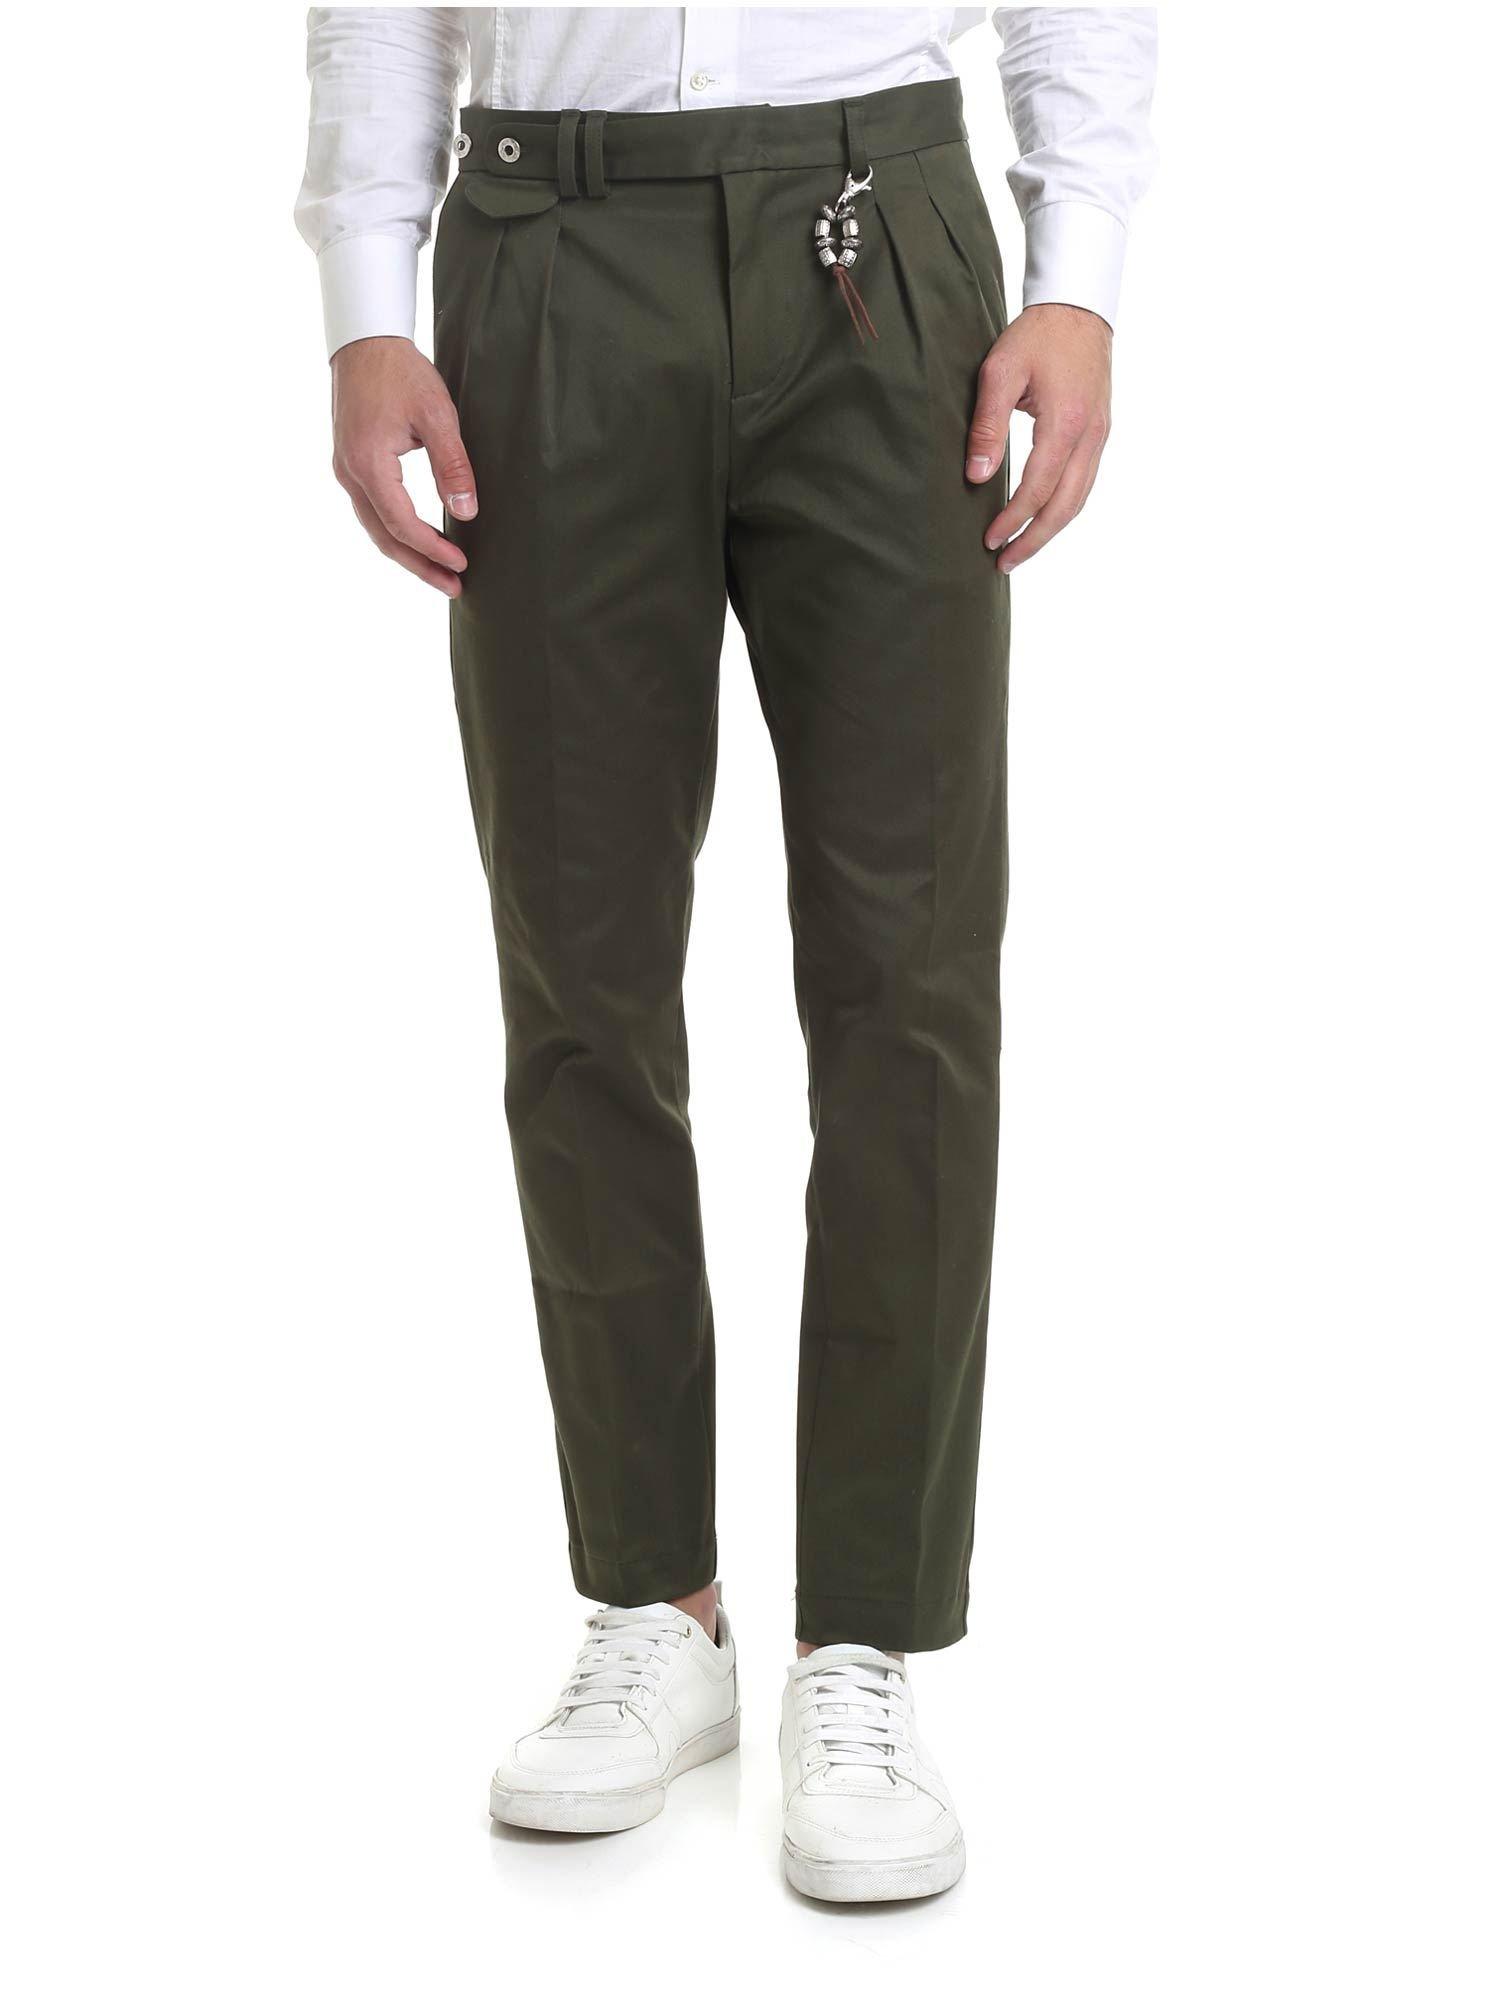 Image of Pantalone R96 verde doppia pences